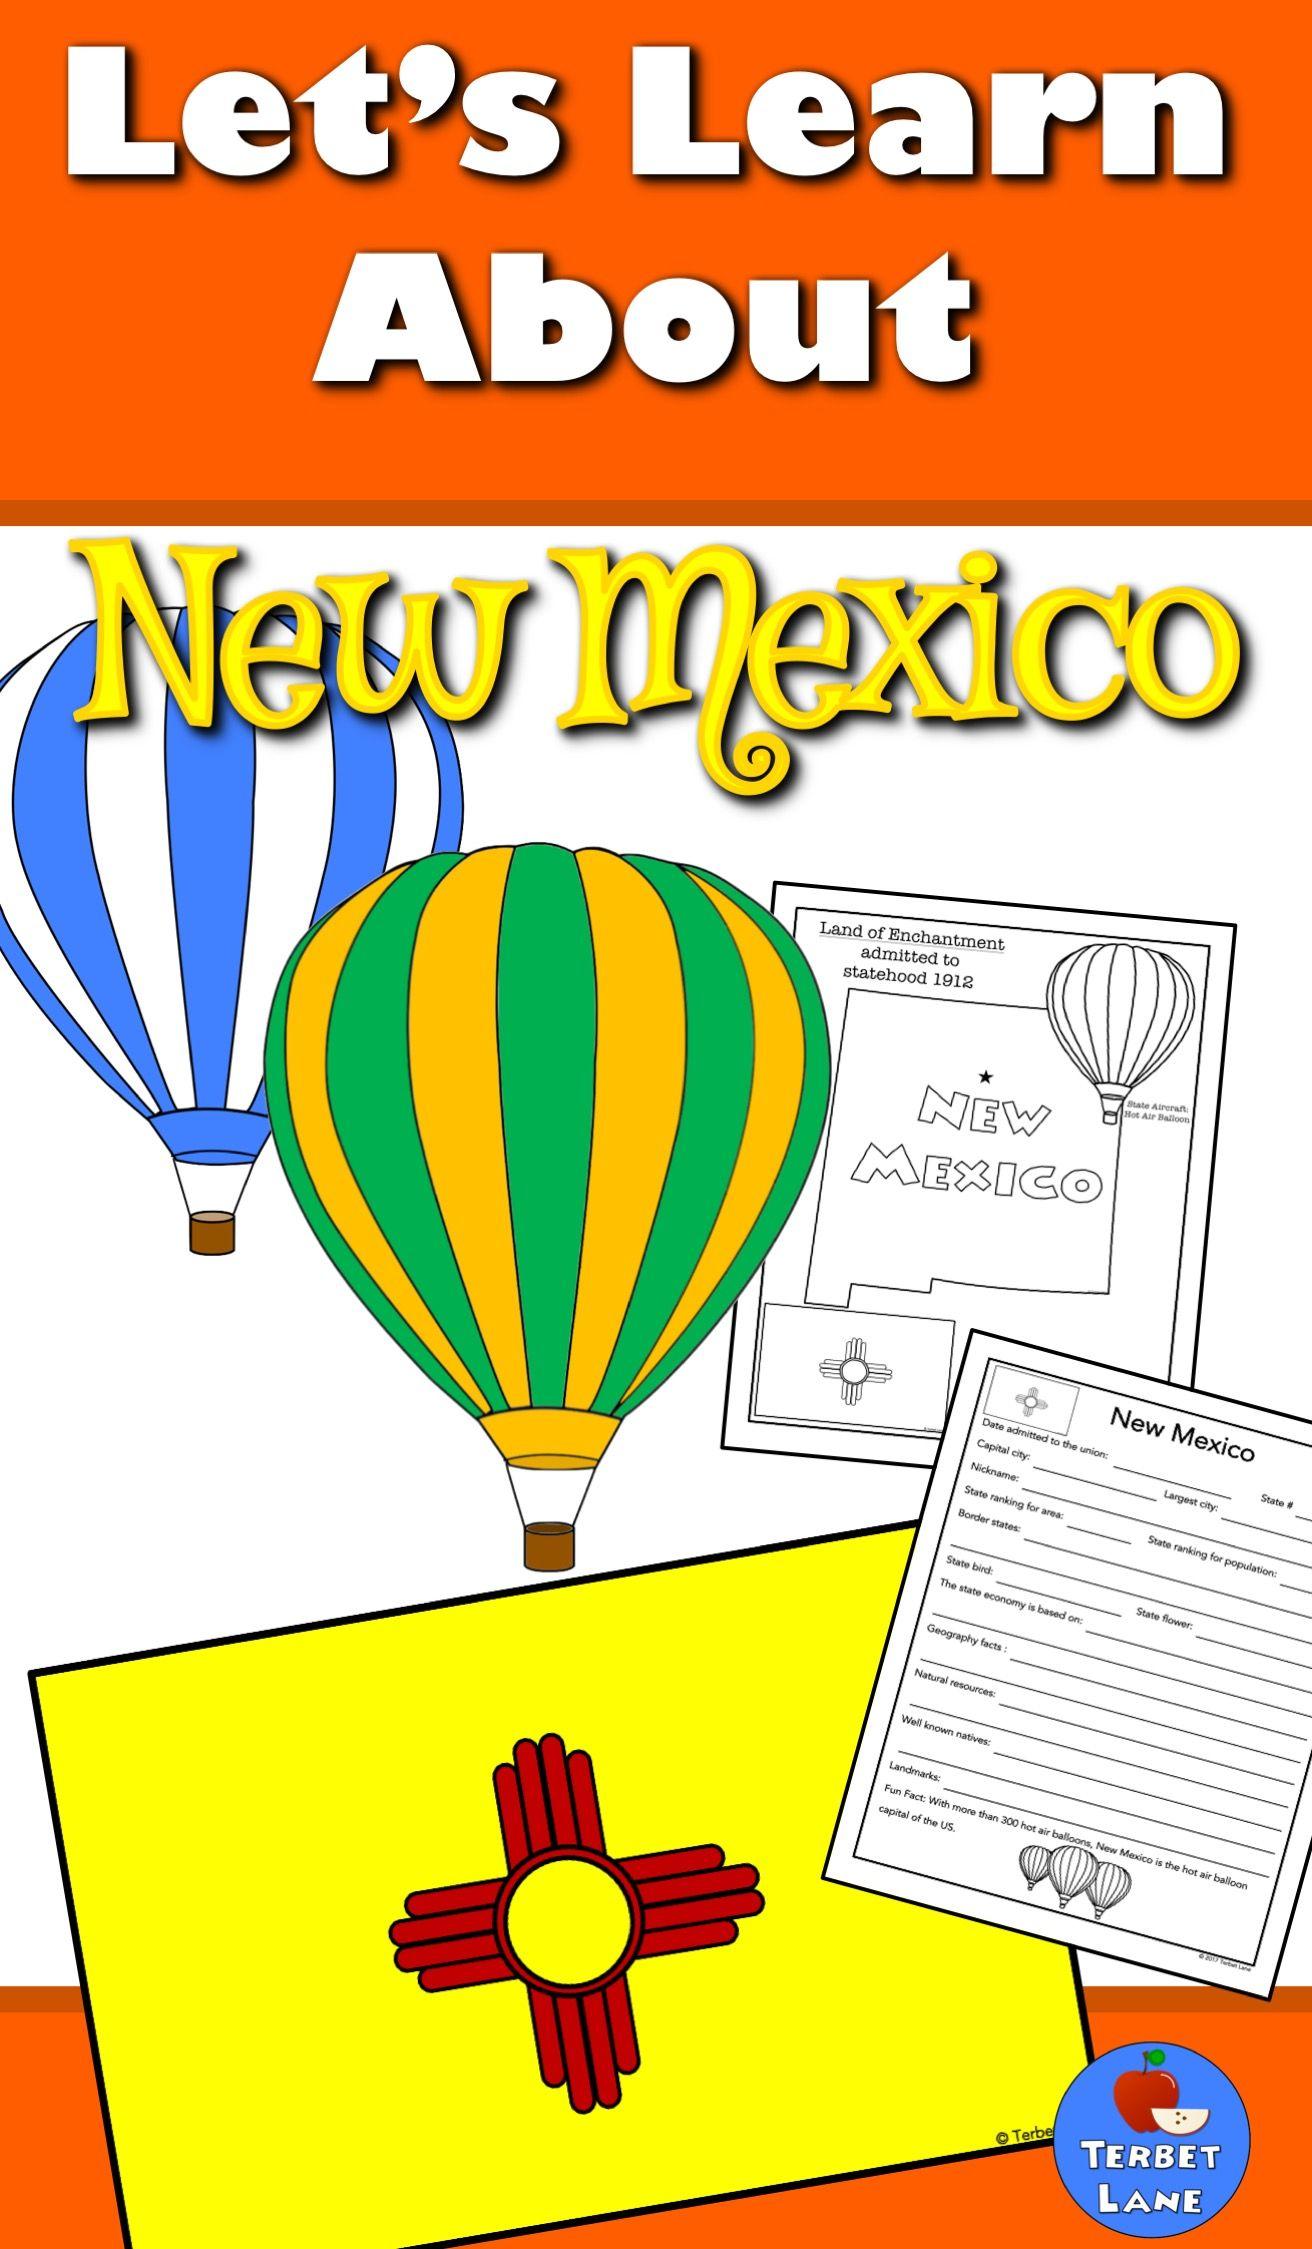 New Mexico History And Symbols Unit Study Pinterest Unit Studies